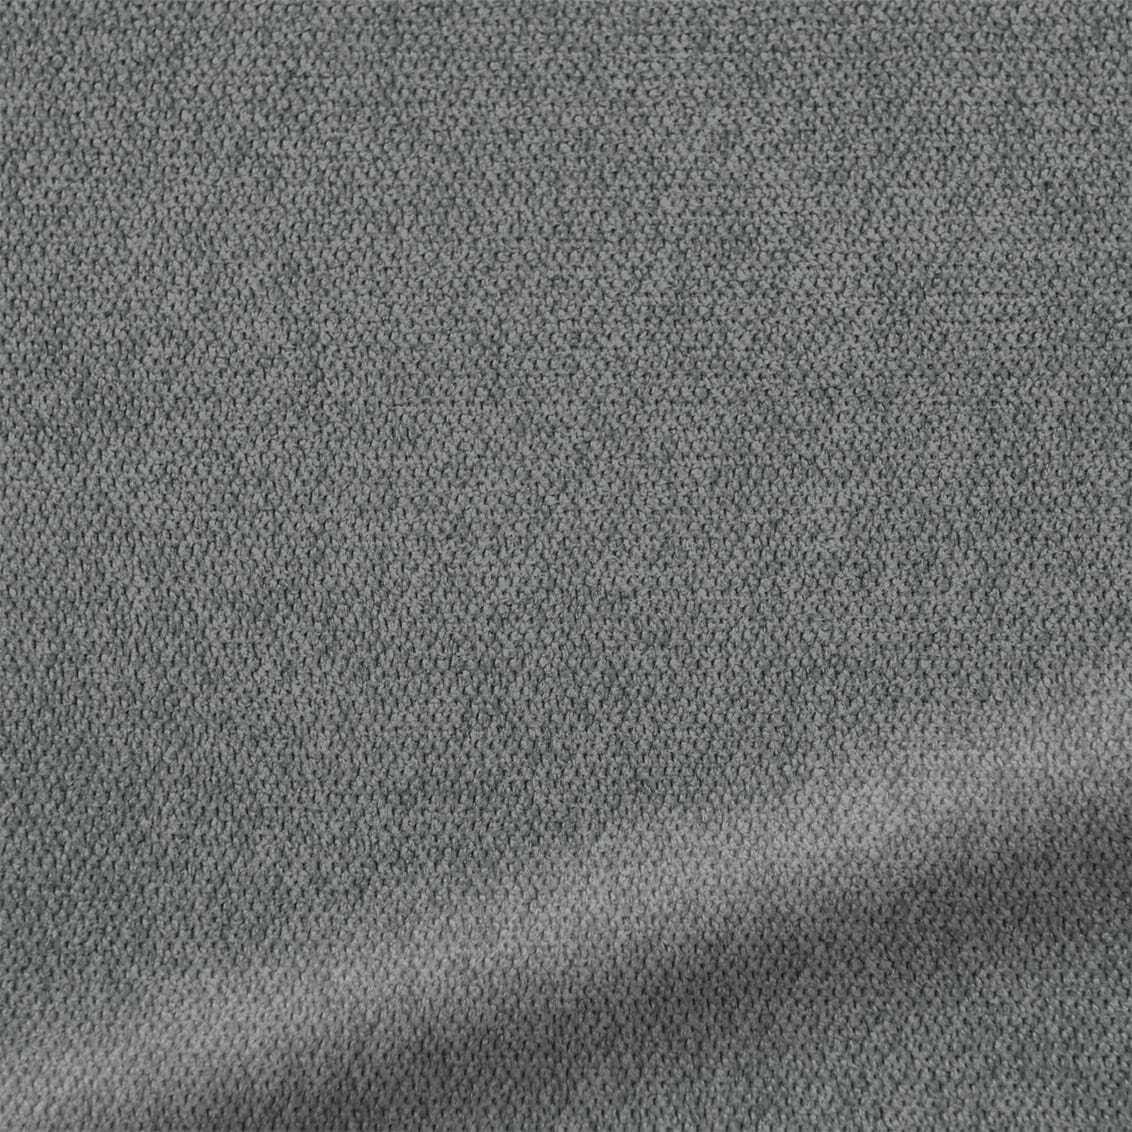 Velours mat anthracite